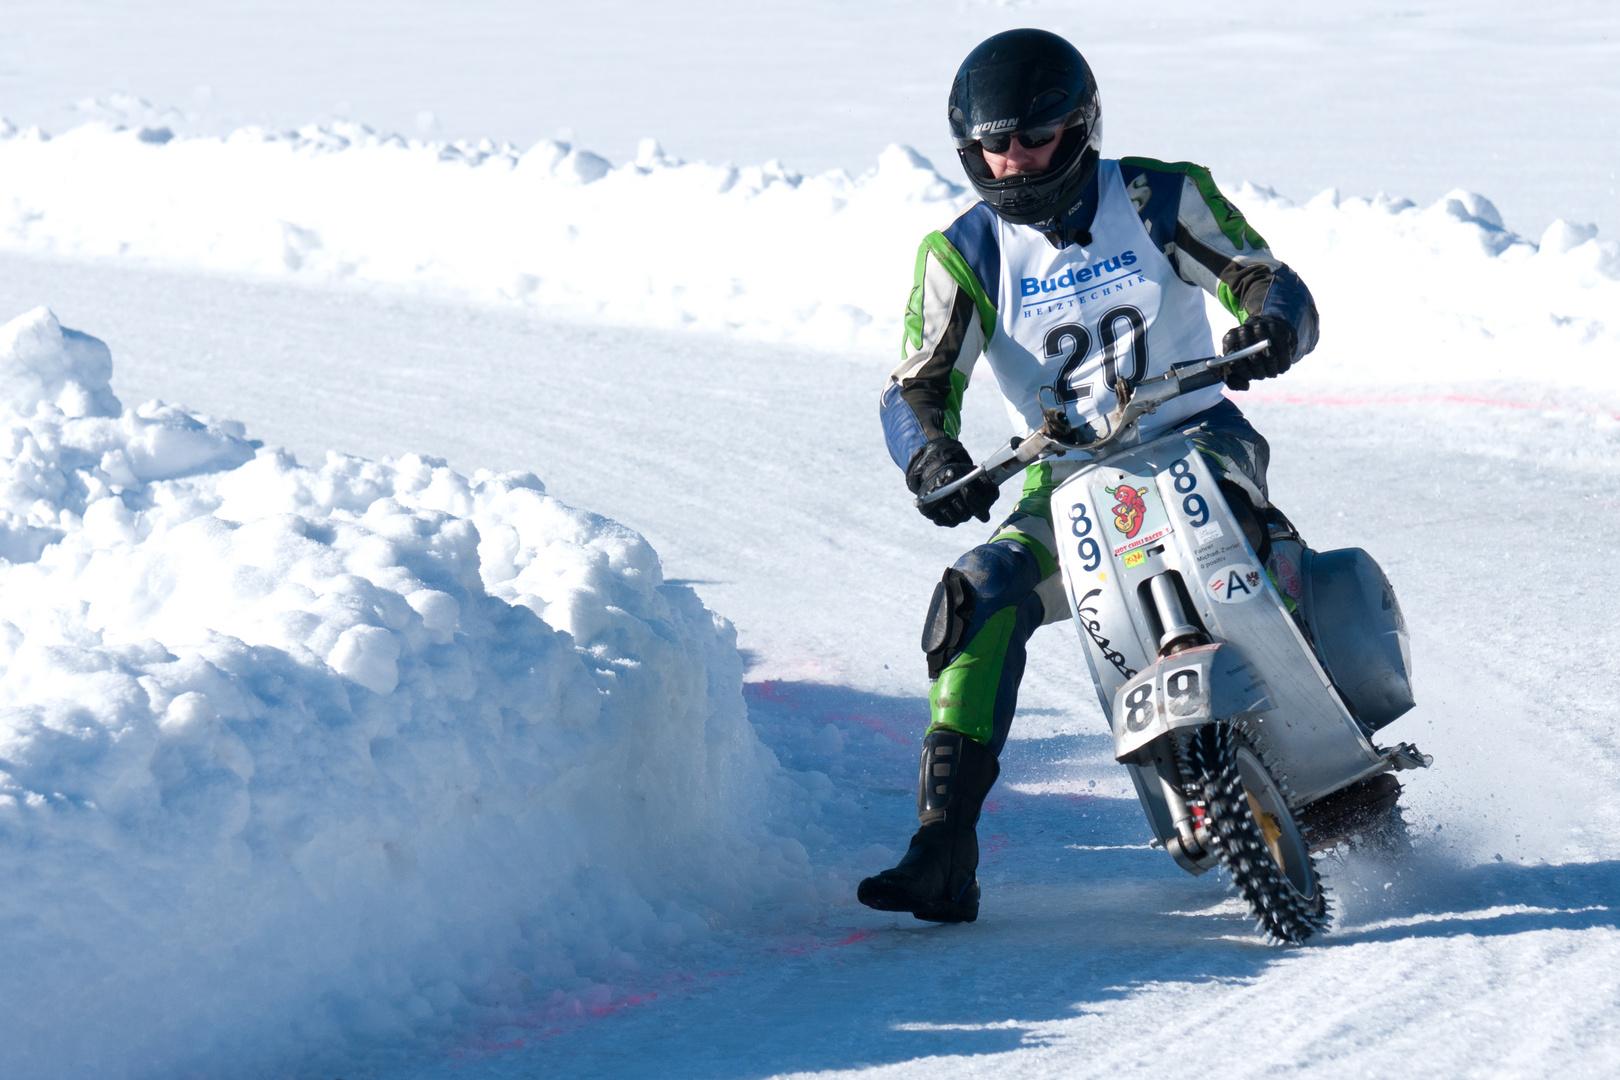 3 Eisrennen der Ybbstaler Rollerflotte ..